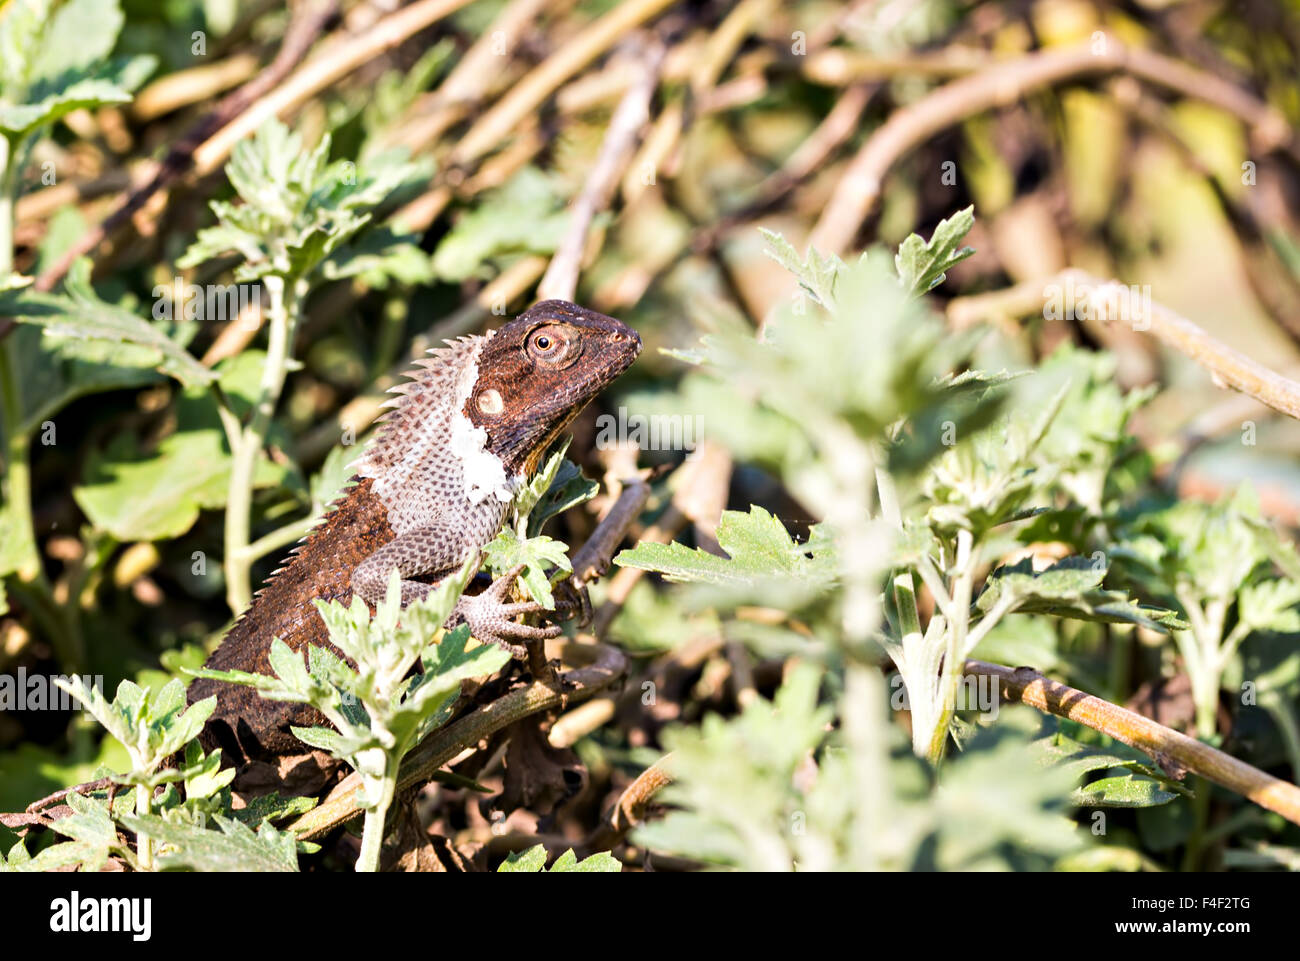 small-dark-brown-lizard-resting-on-a-chr